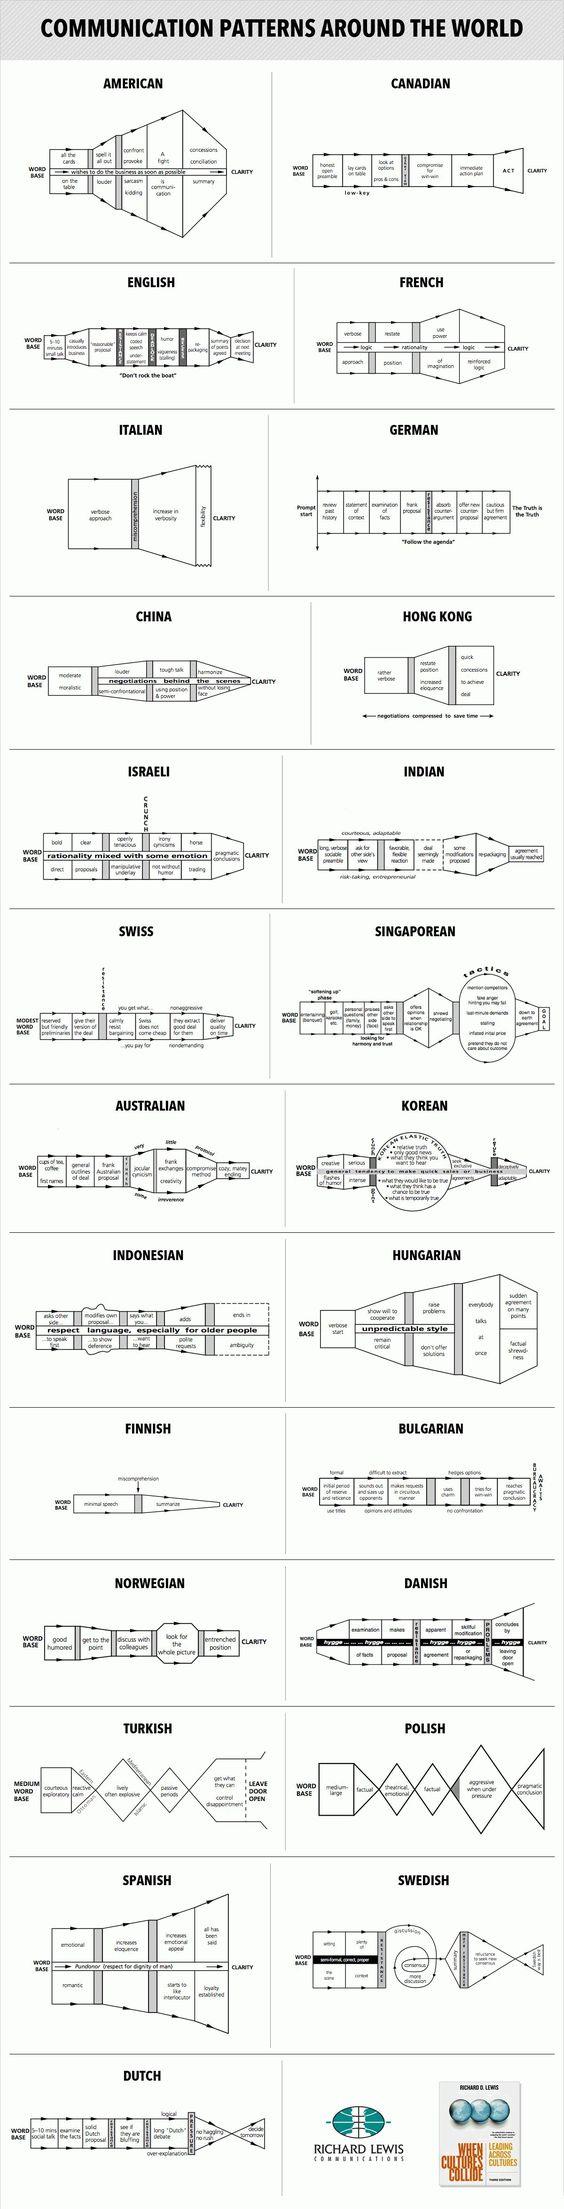 25 países y sus técnicas de comunicación particulares en gigantesco infográfico (IMAGEN) « Pijamasurf - Noticias e Información alternativa